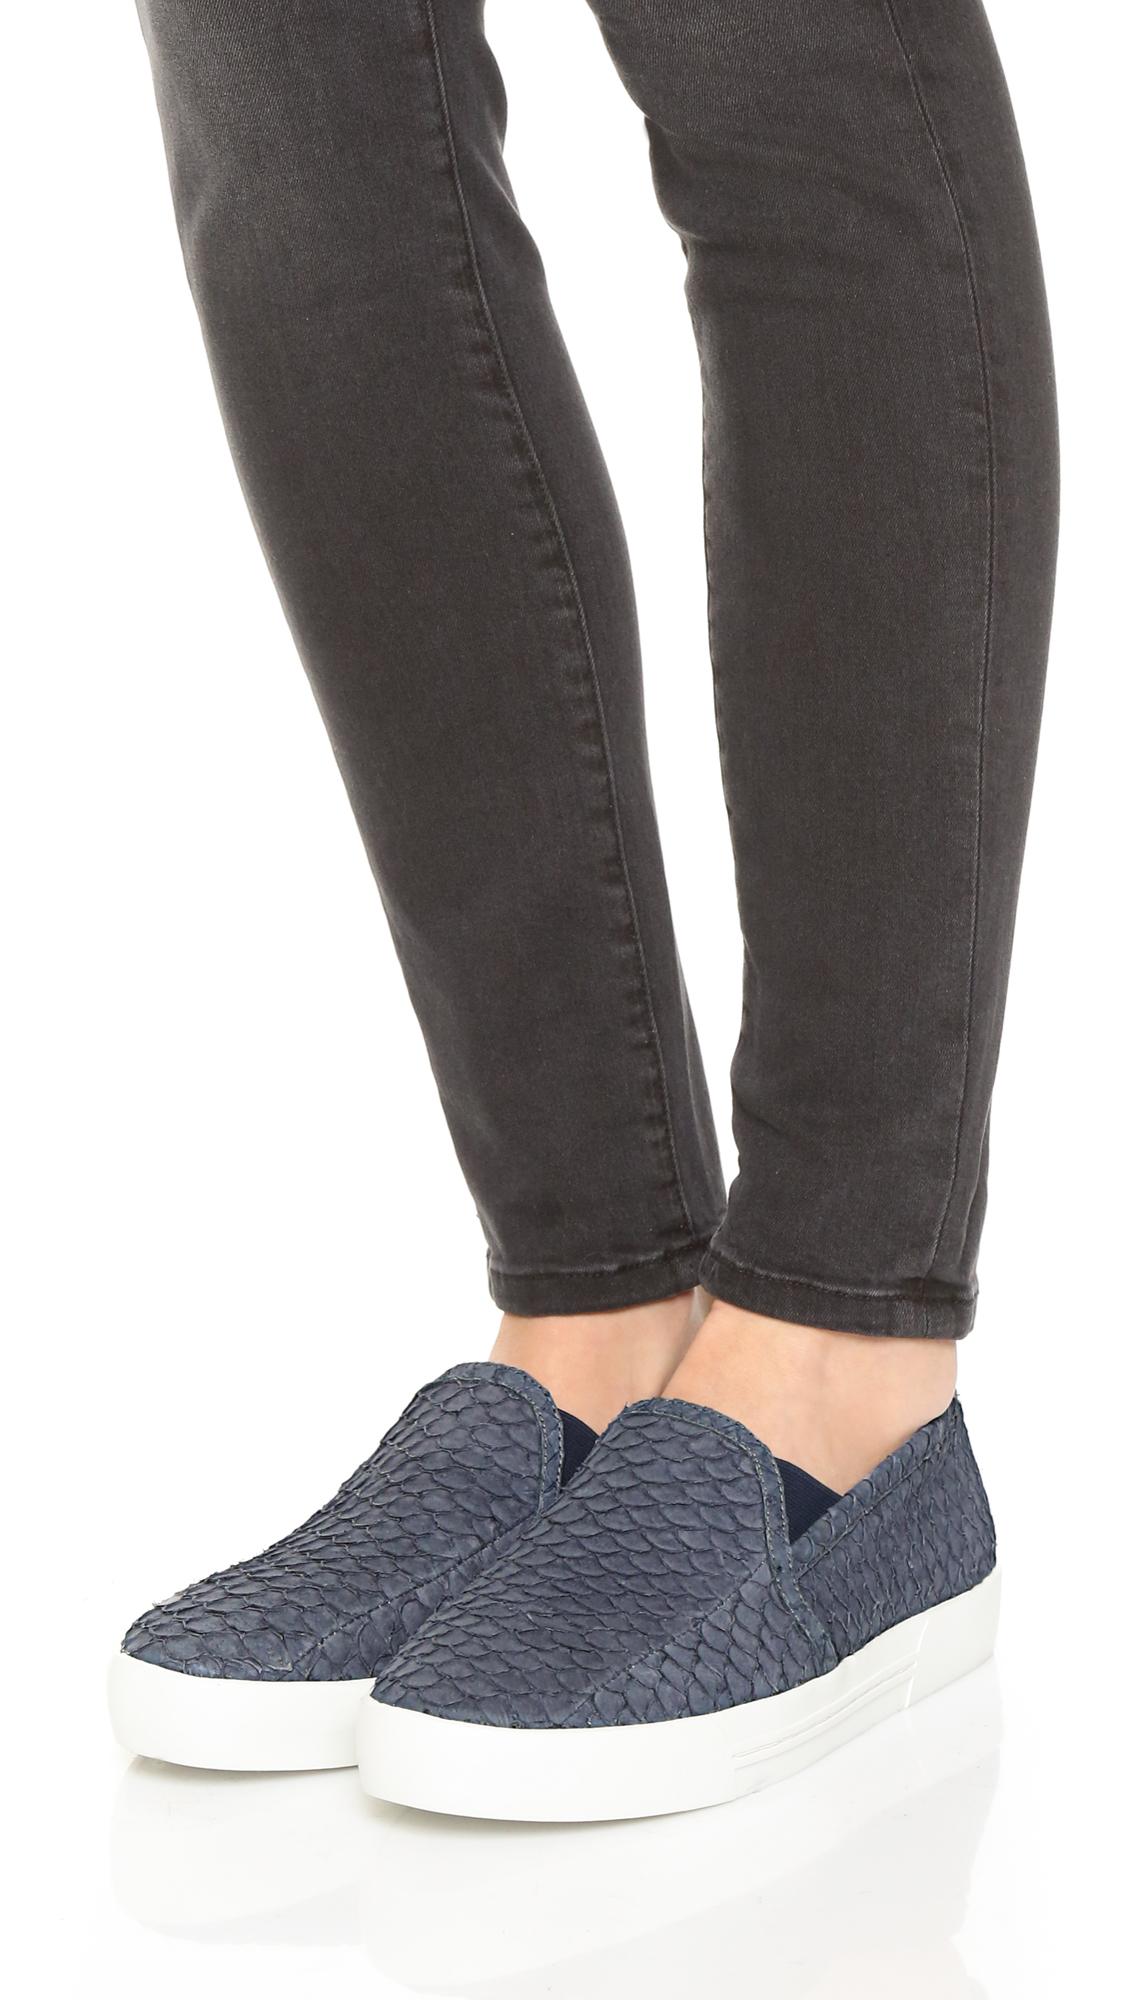 Joie Denim Huxley Slip On Sneakers in Dark Denim (Blue)